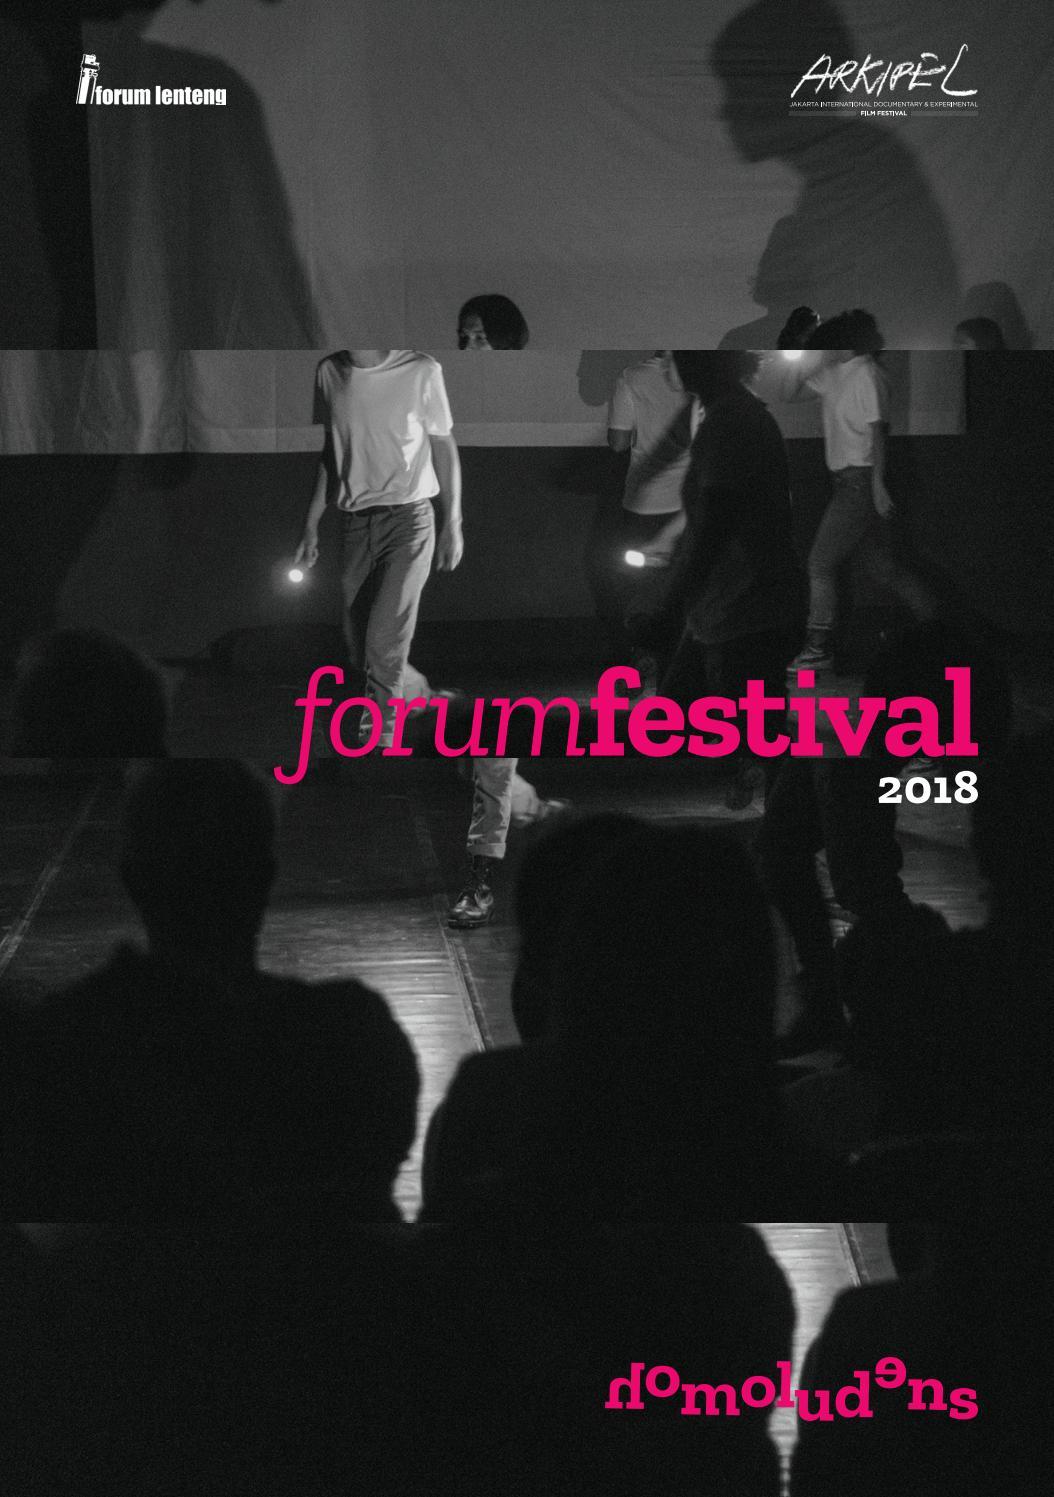 Proceedings Of The Forum Festival ARKIPEL Homoludens By